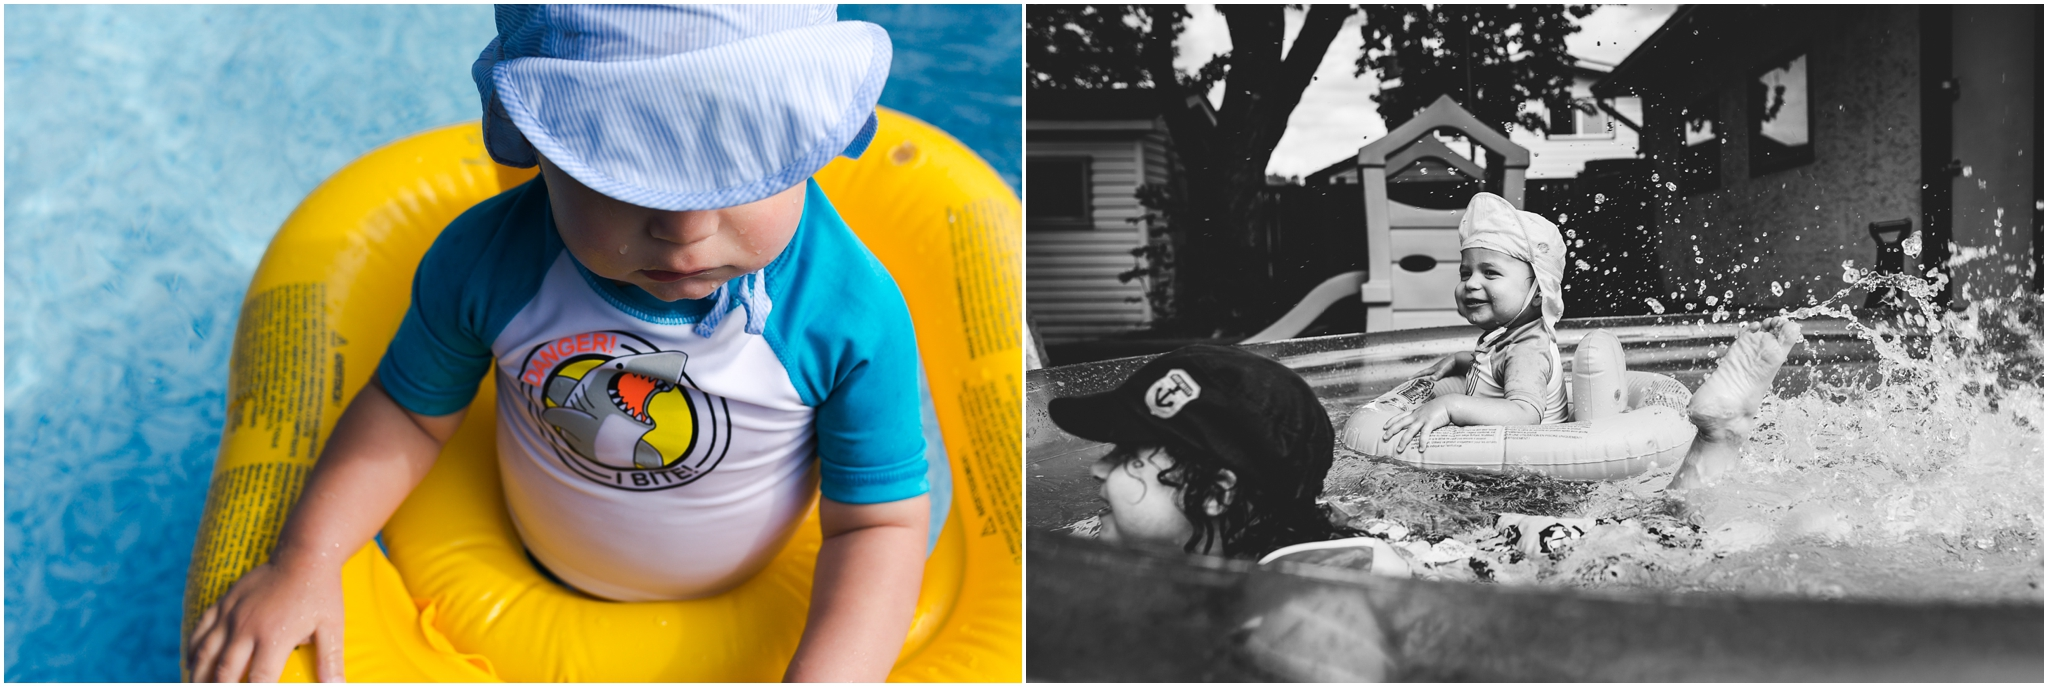 Edmonton Documentary Photographer - Best of 2016 - Summer - Swimming - YEG pool